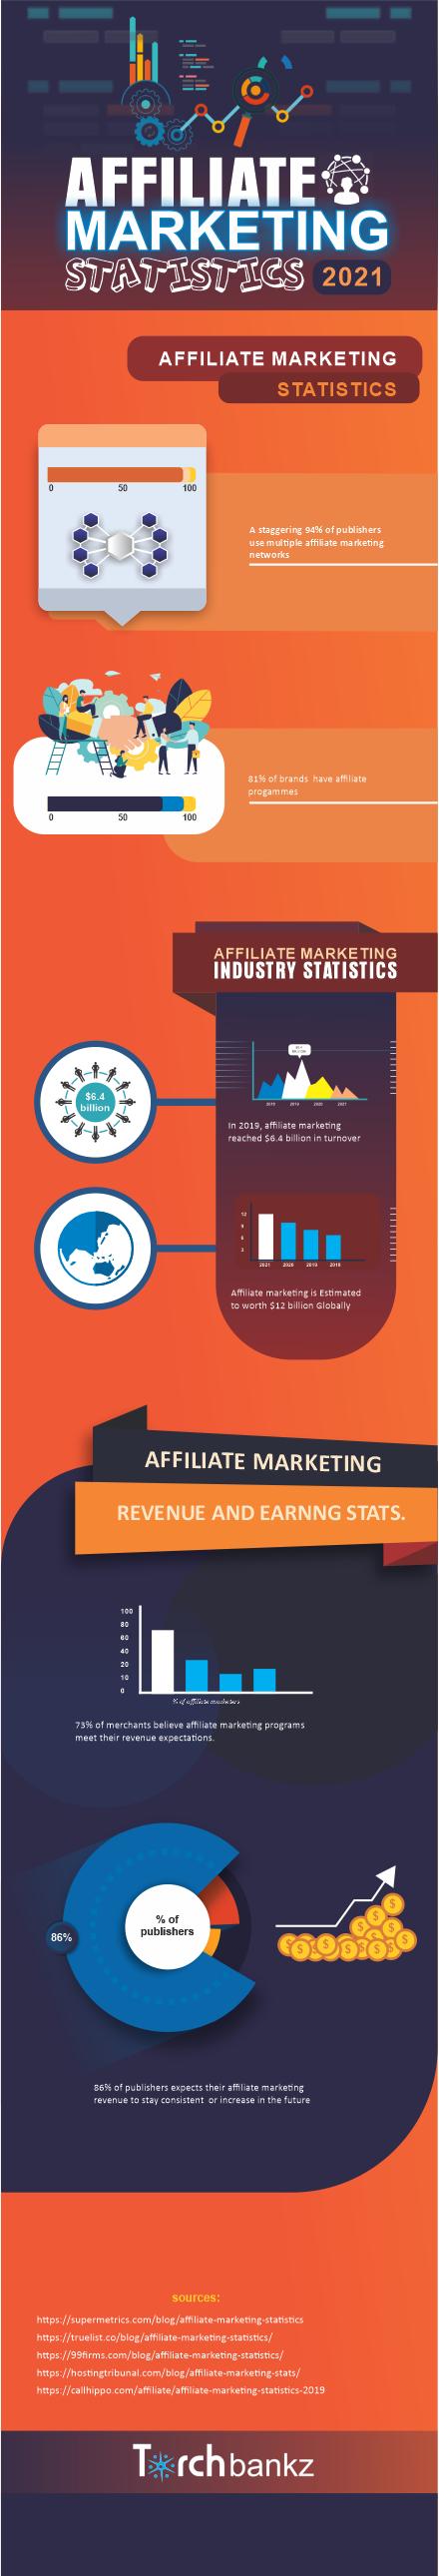 Affiliate Marketing statistics infographic